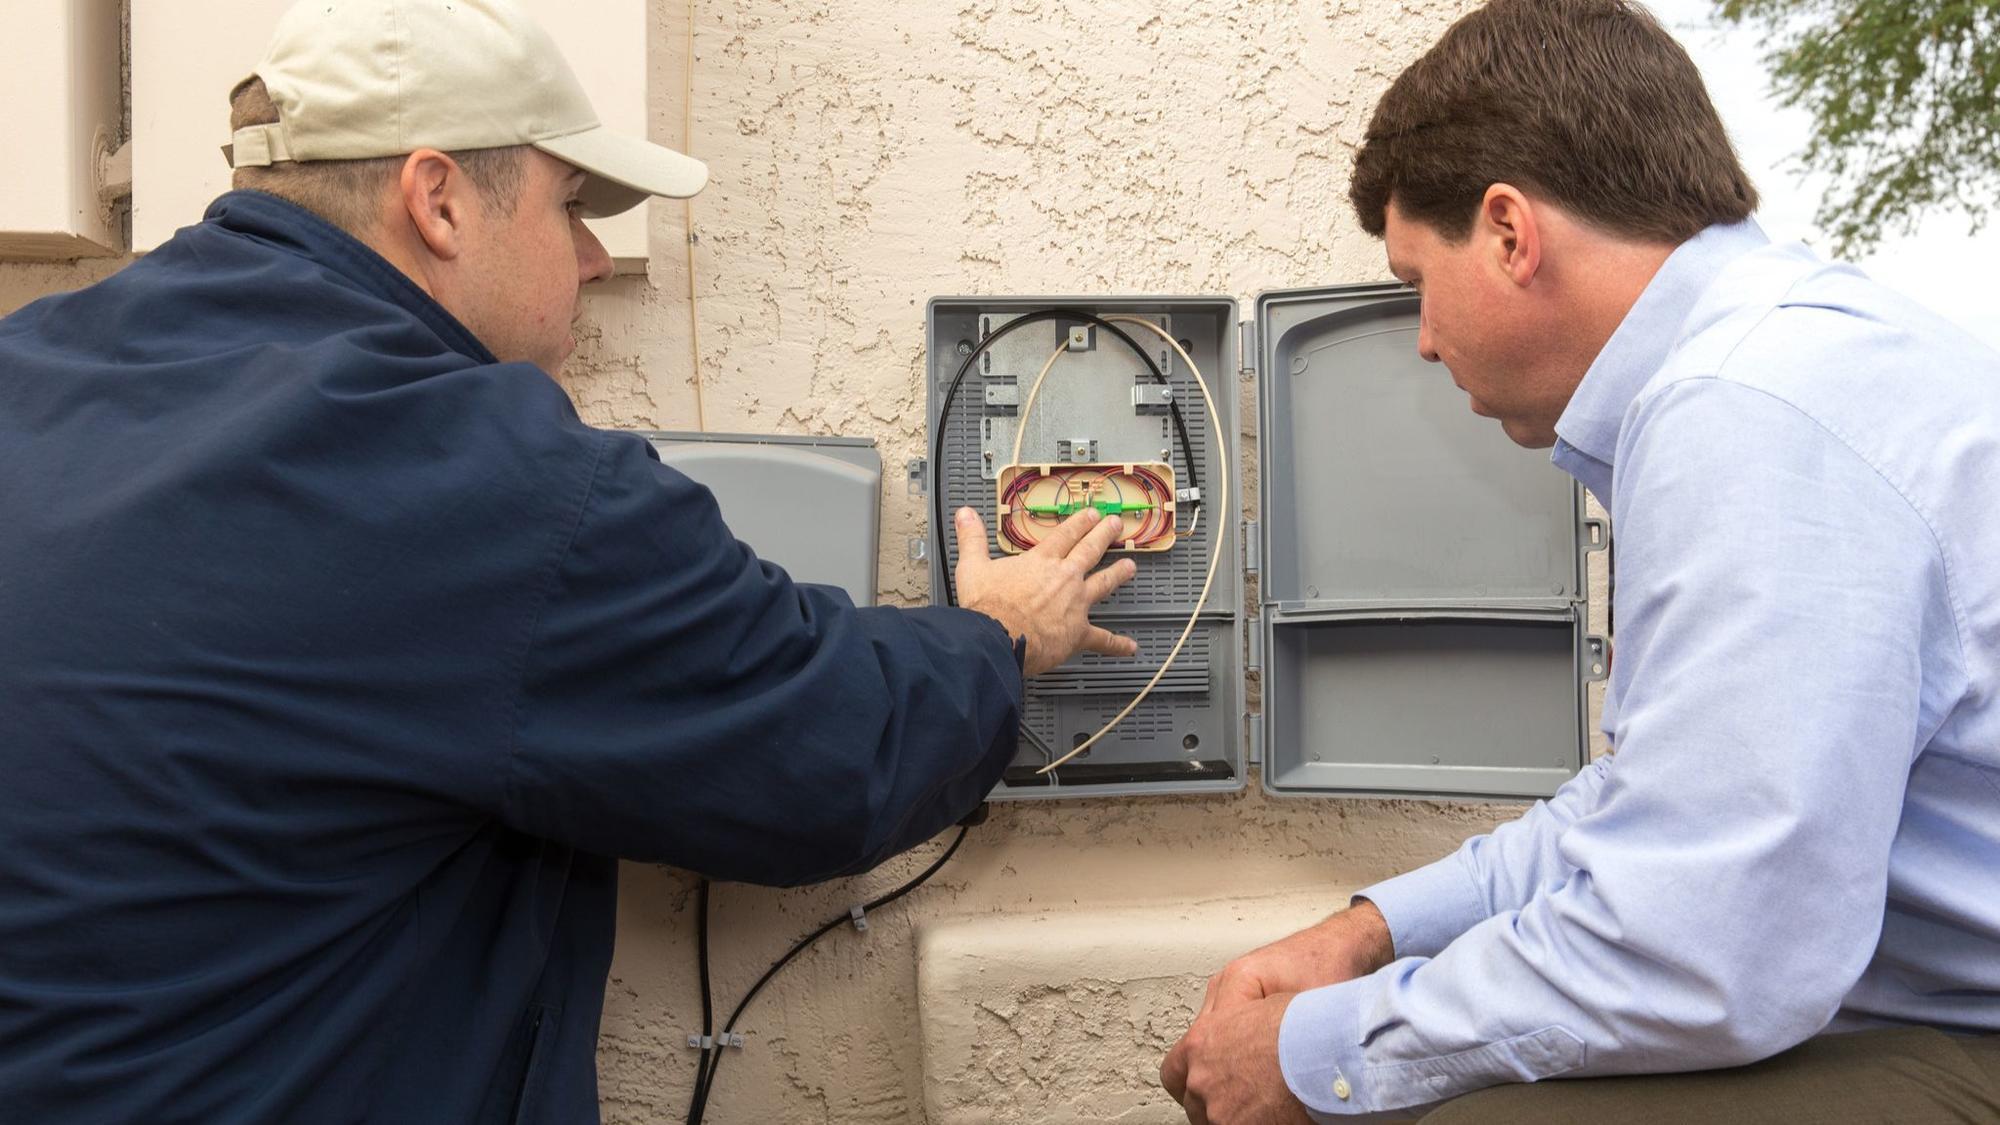 Cox Spectrum Upgrade Networks To Bring Gigabit Internet